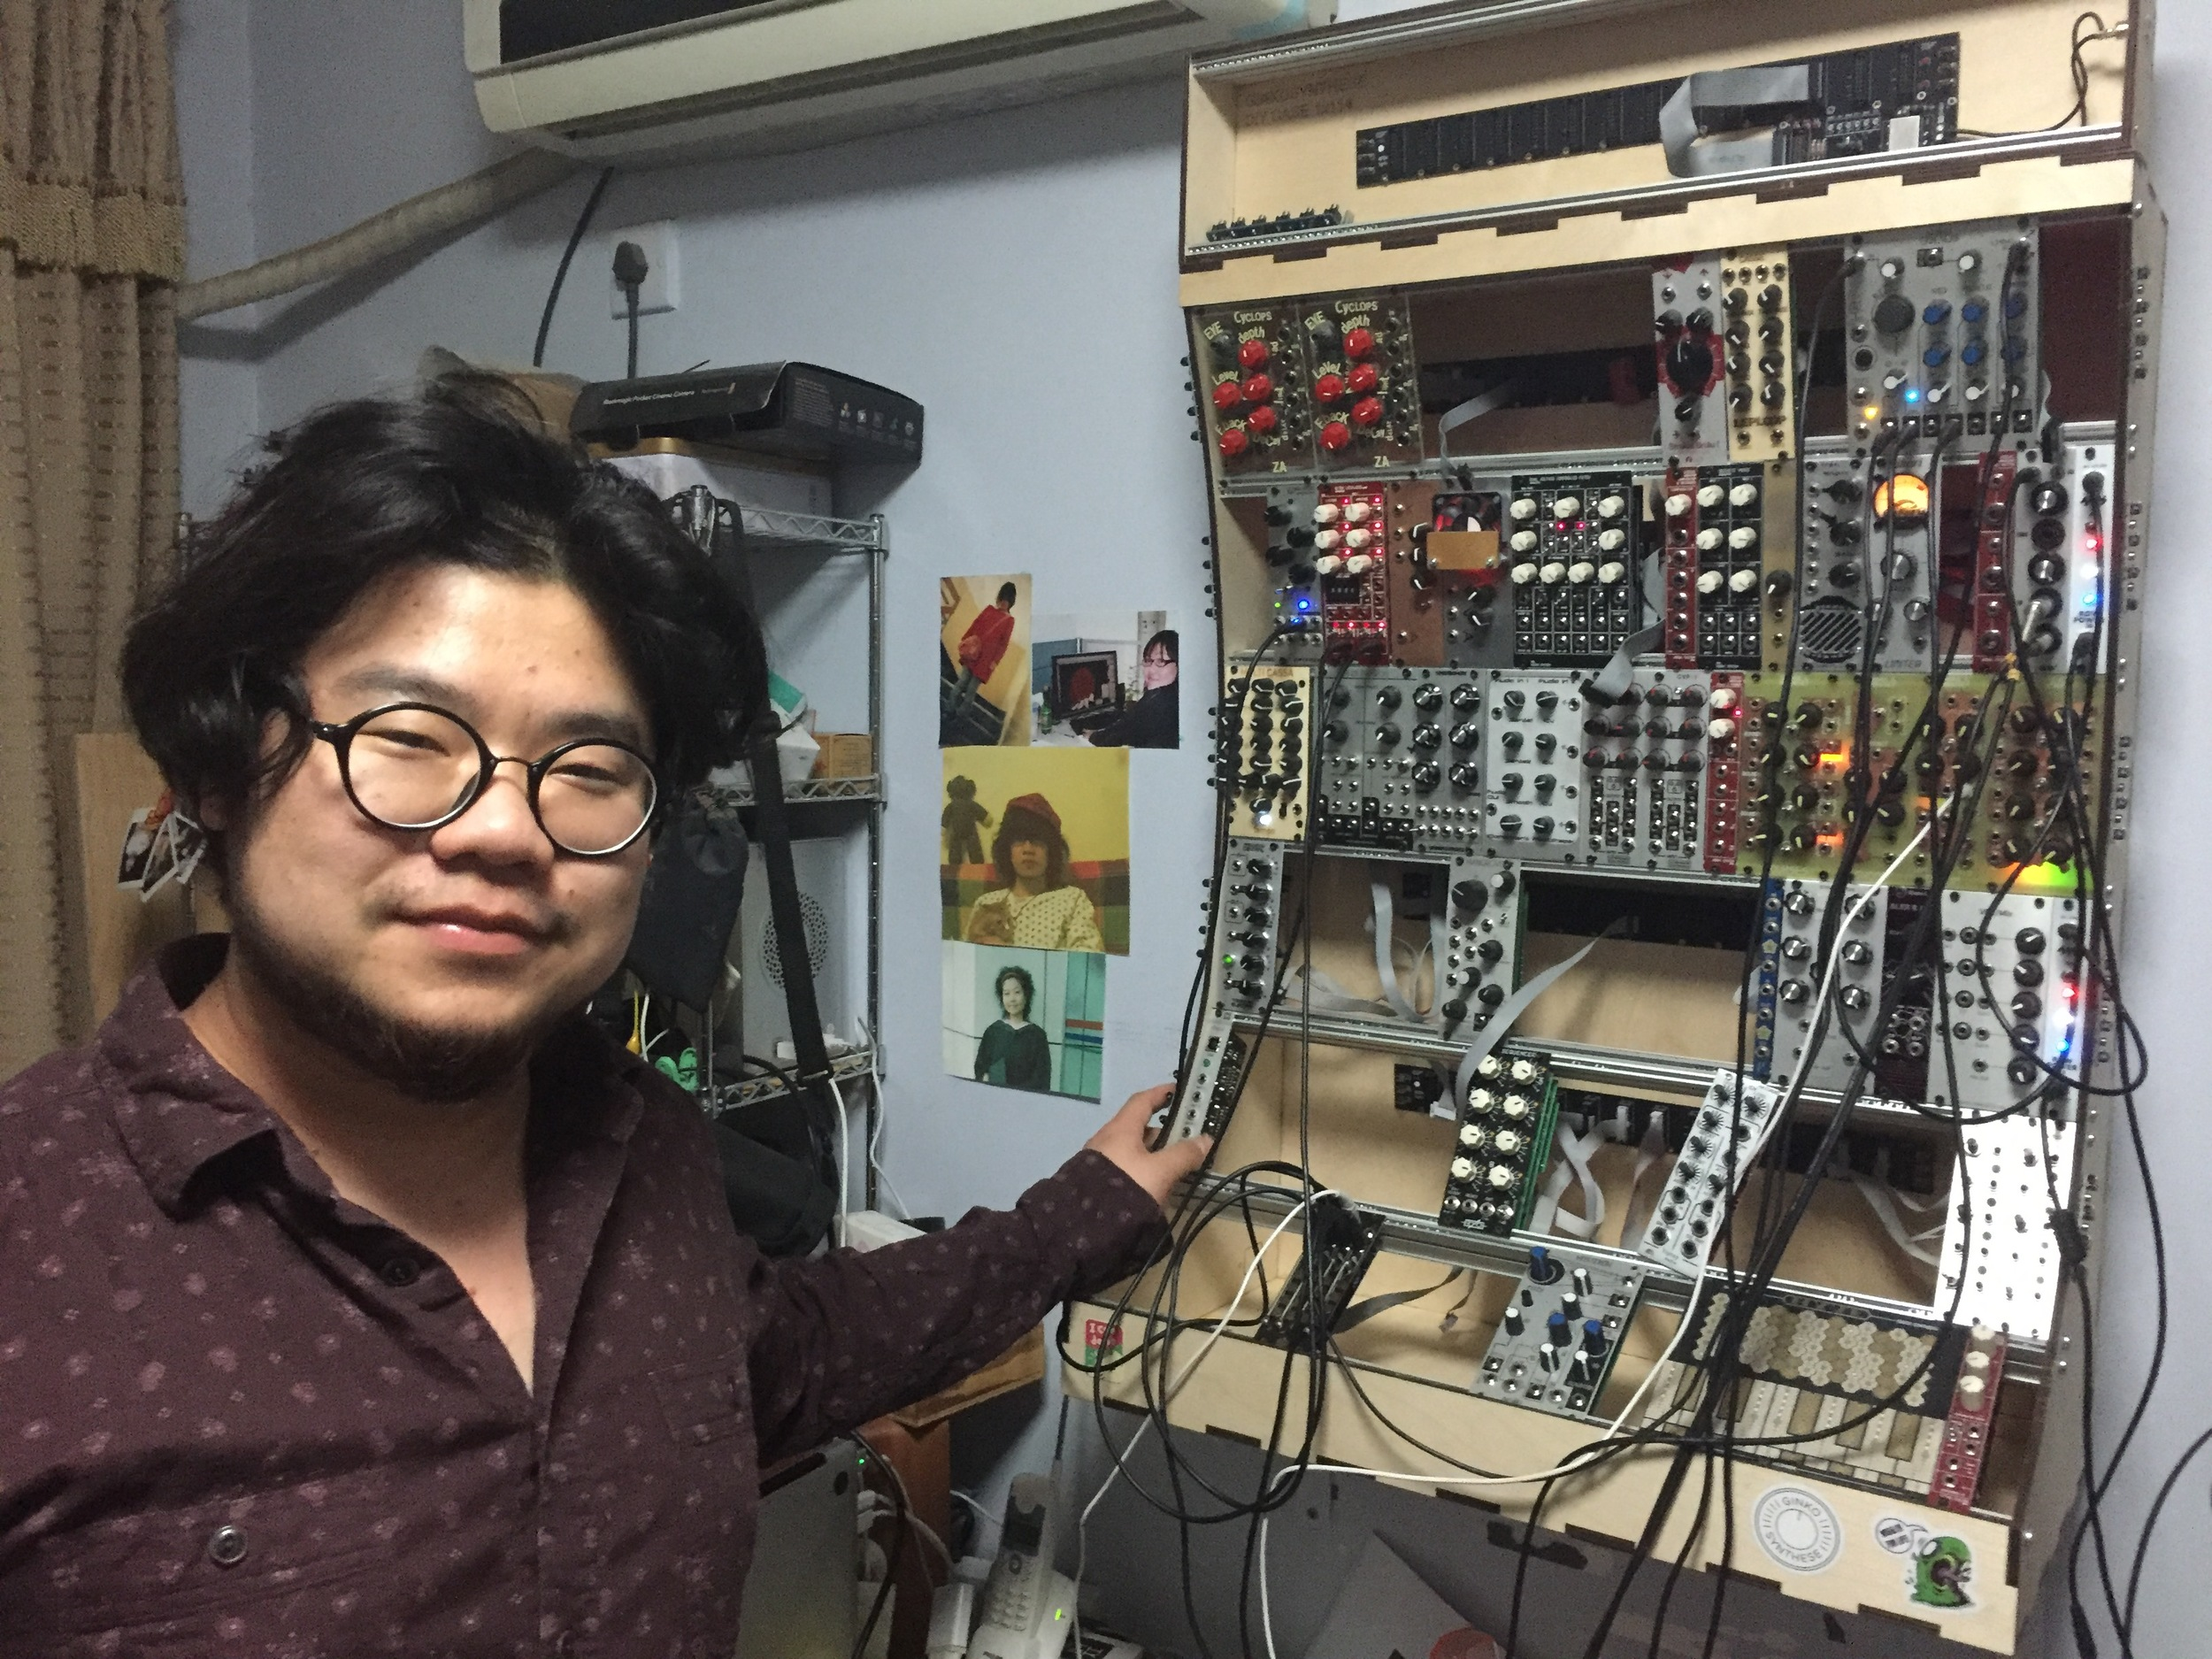 Meng Qi's home workshop